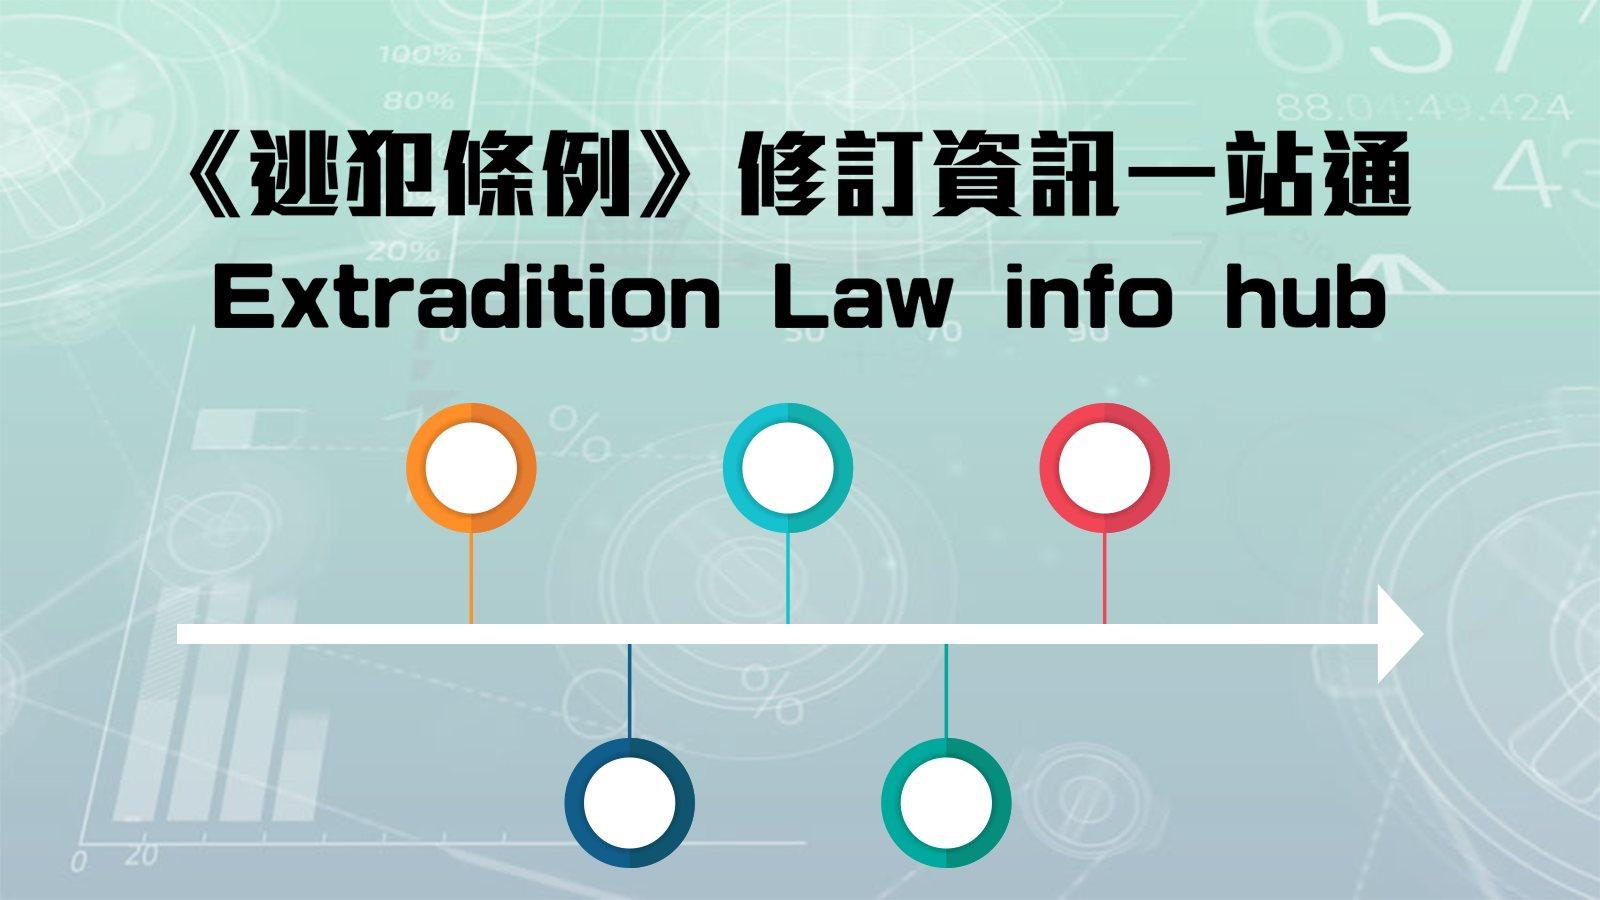 《逃犯條例》修訂資訊一站通 Extradition Law info hub